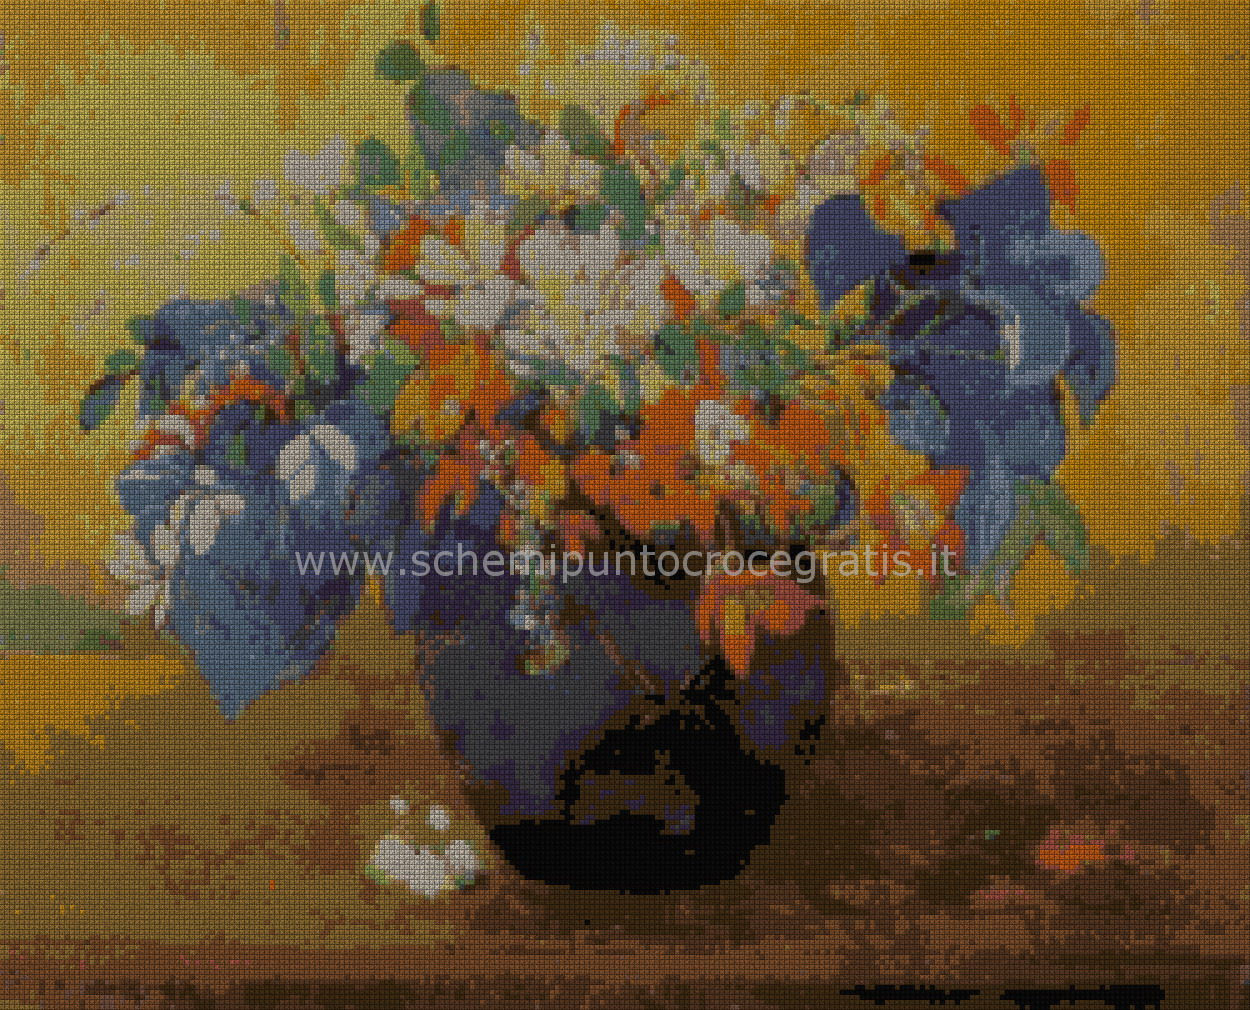 pittori_moderni/gauguin/gauguin02.jpg